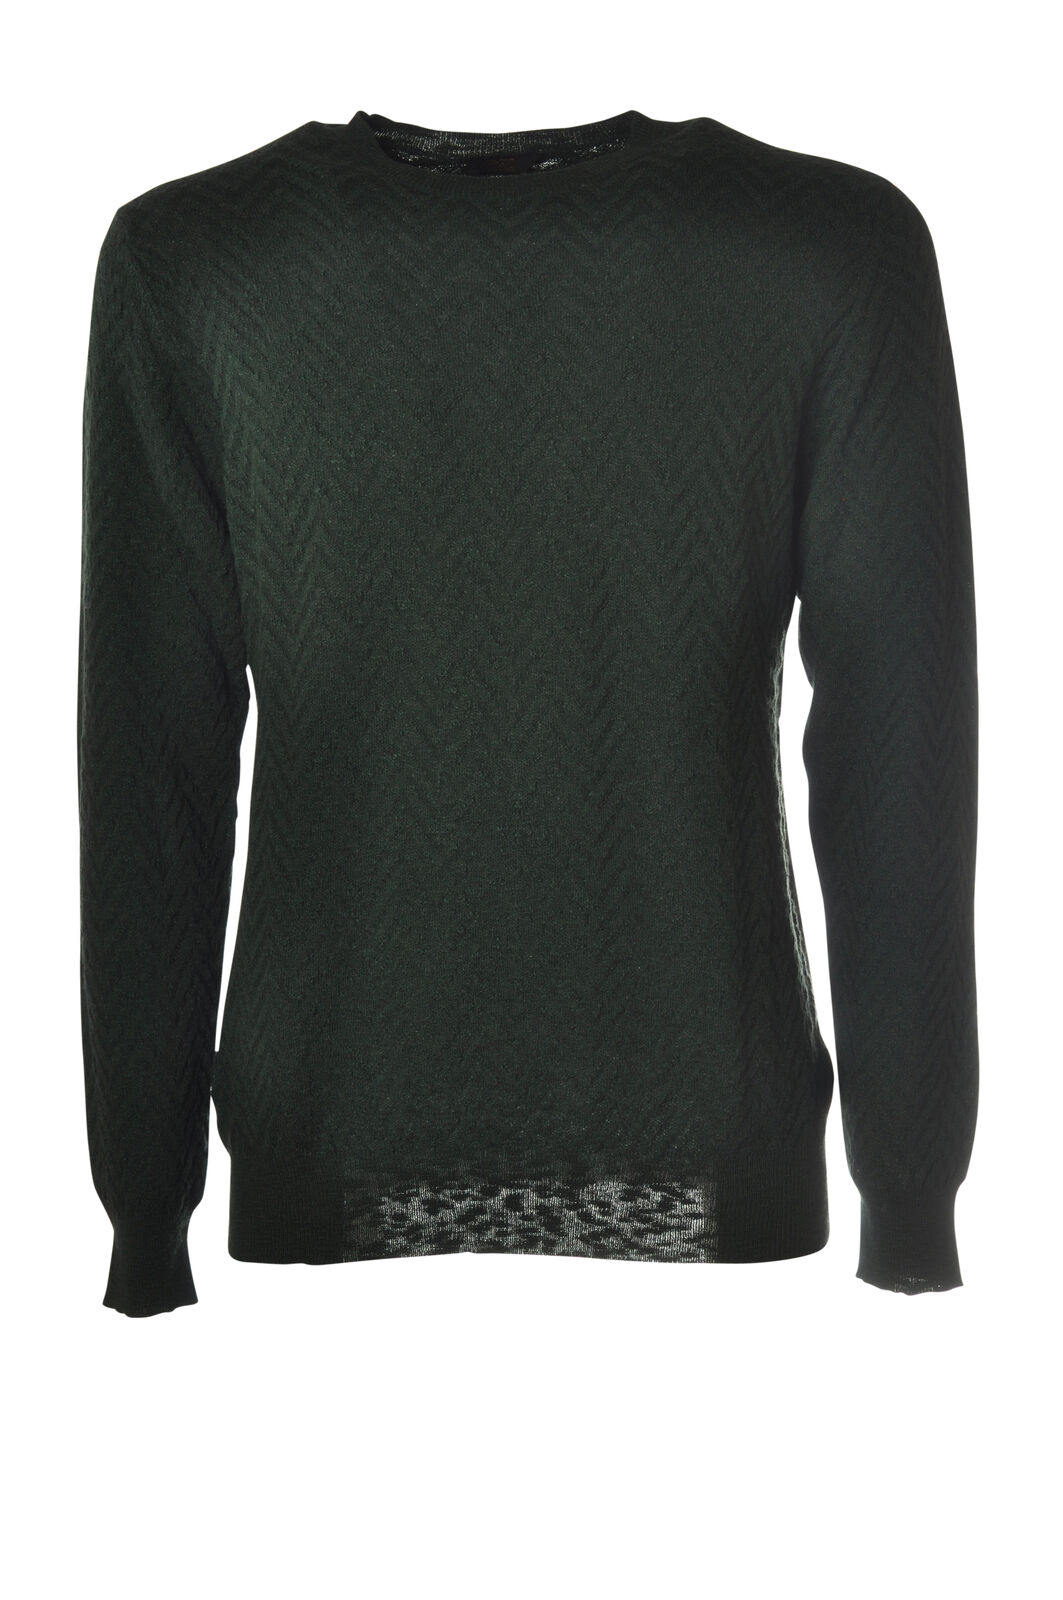 Hosio - Maglieria-Pullover - Uomo - verde - 5581029N184135